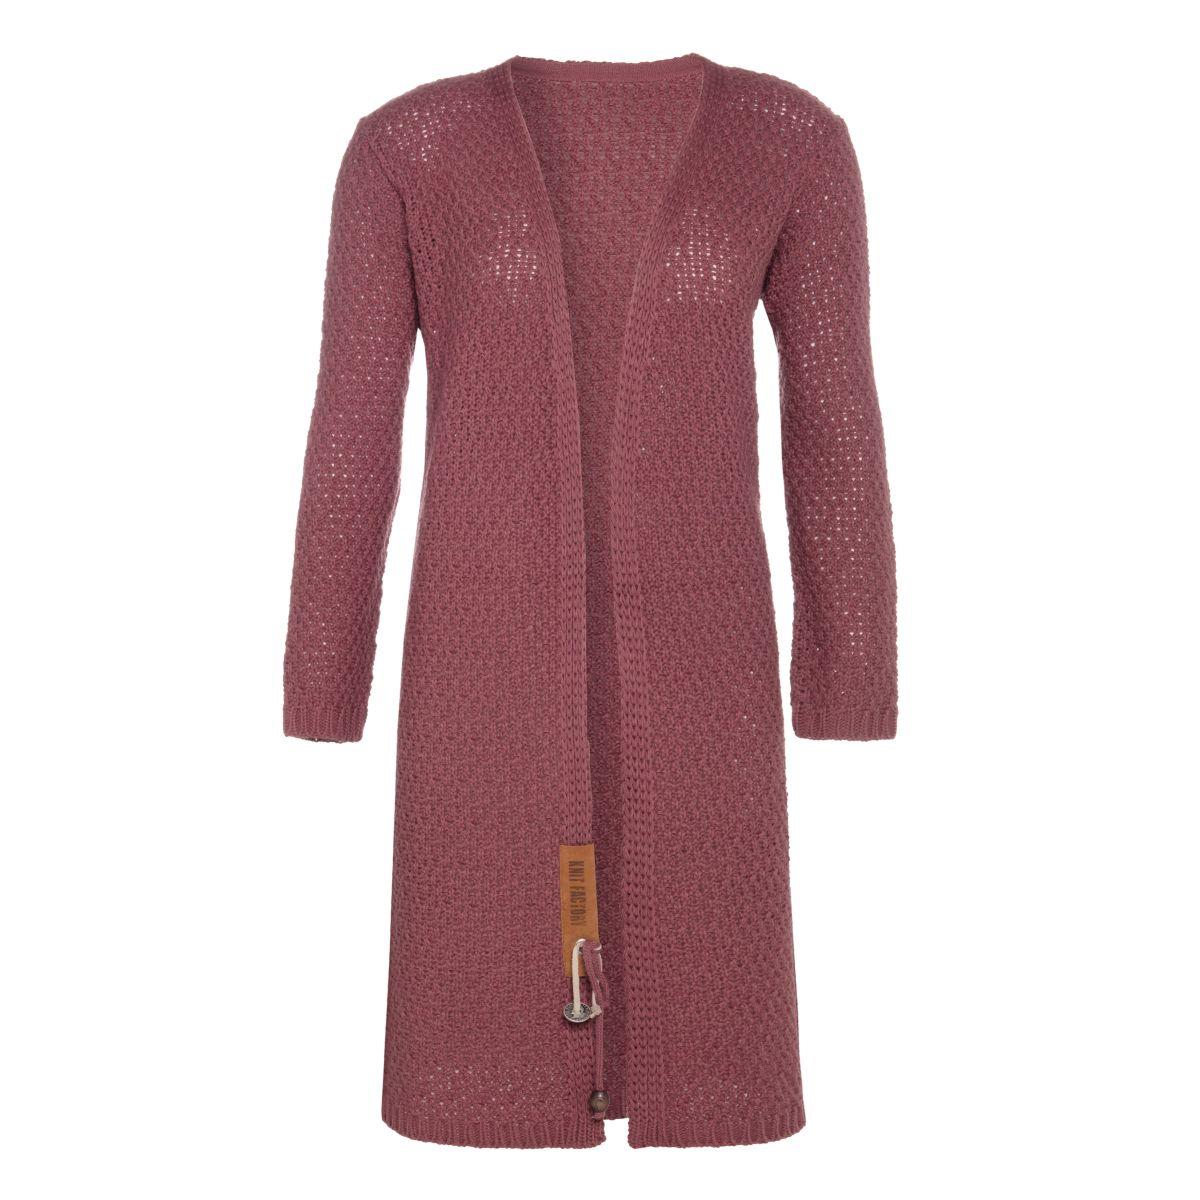 knit factory kf13308203851 luna vest stone red 4042 1